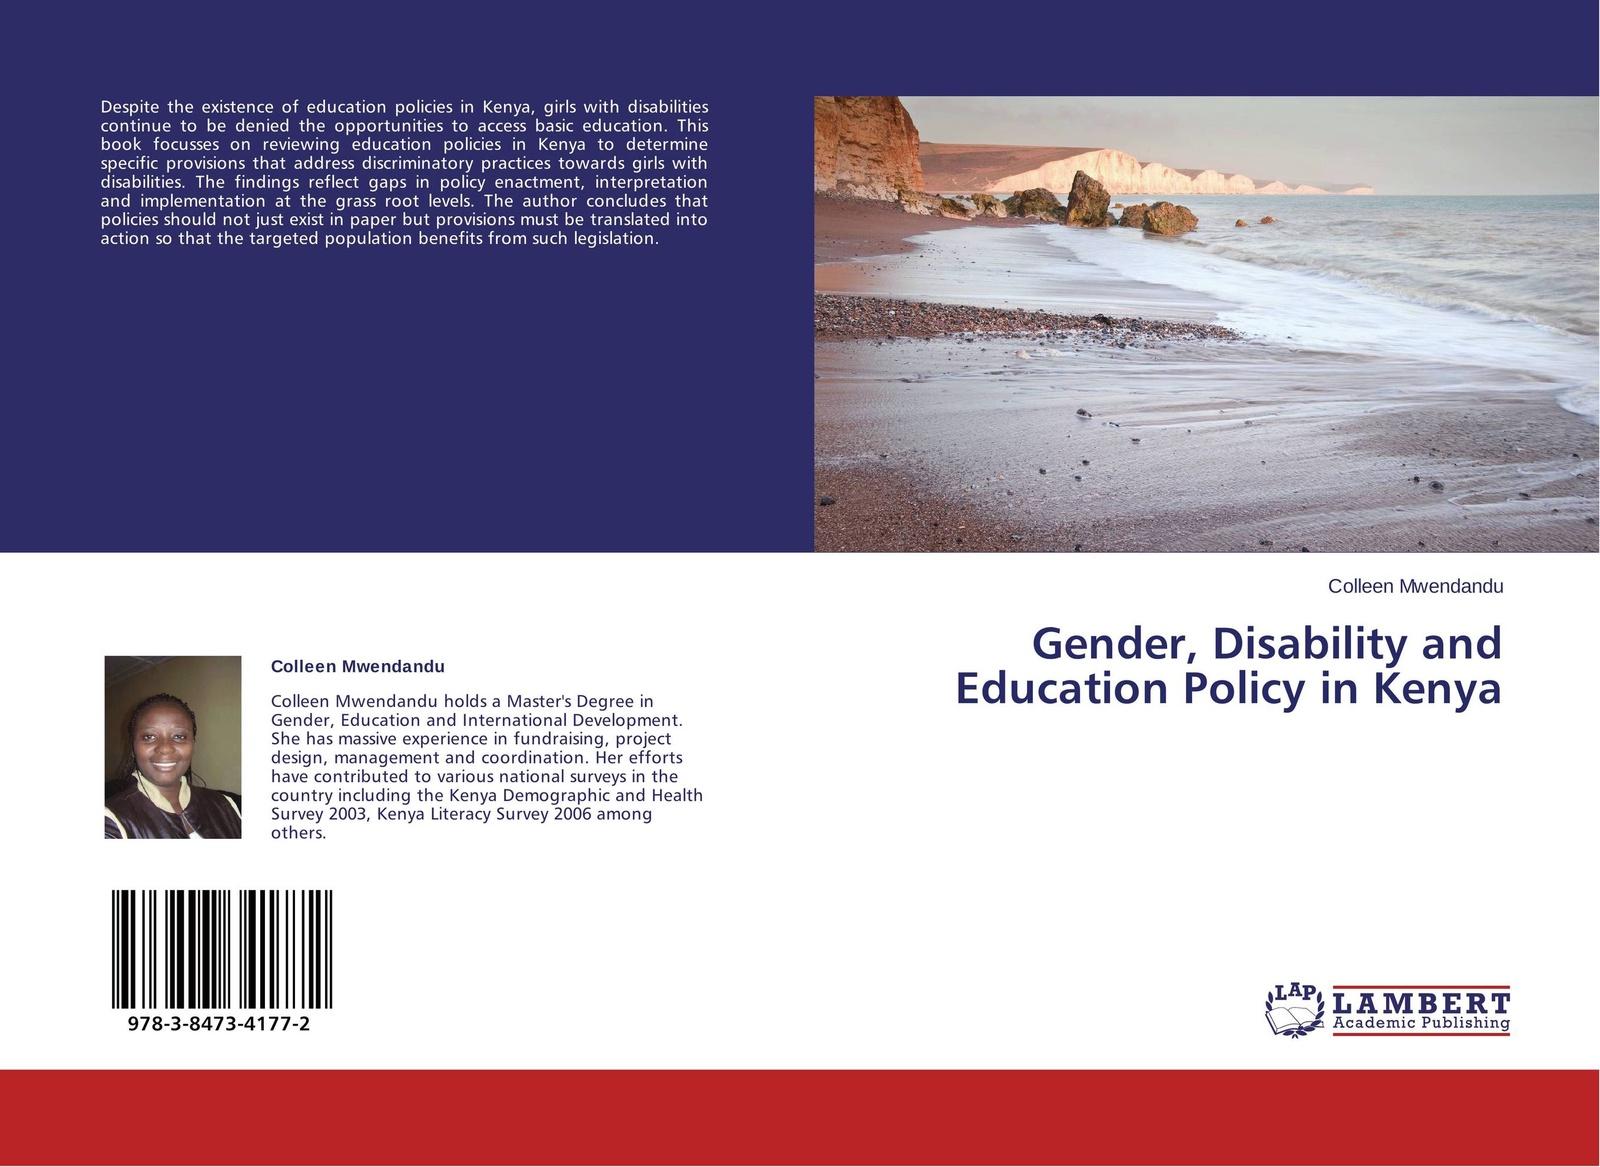 Colleen Mwendandu Gender, Disability and Education Policy in Kenya joseph lelan inclusive education in kenya